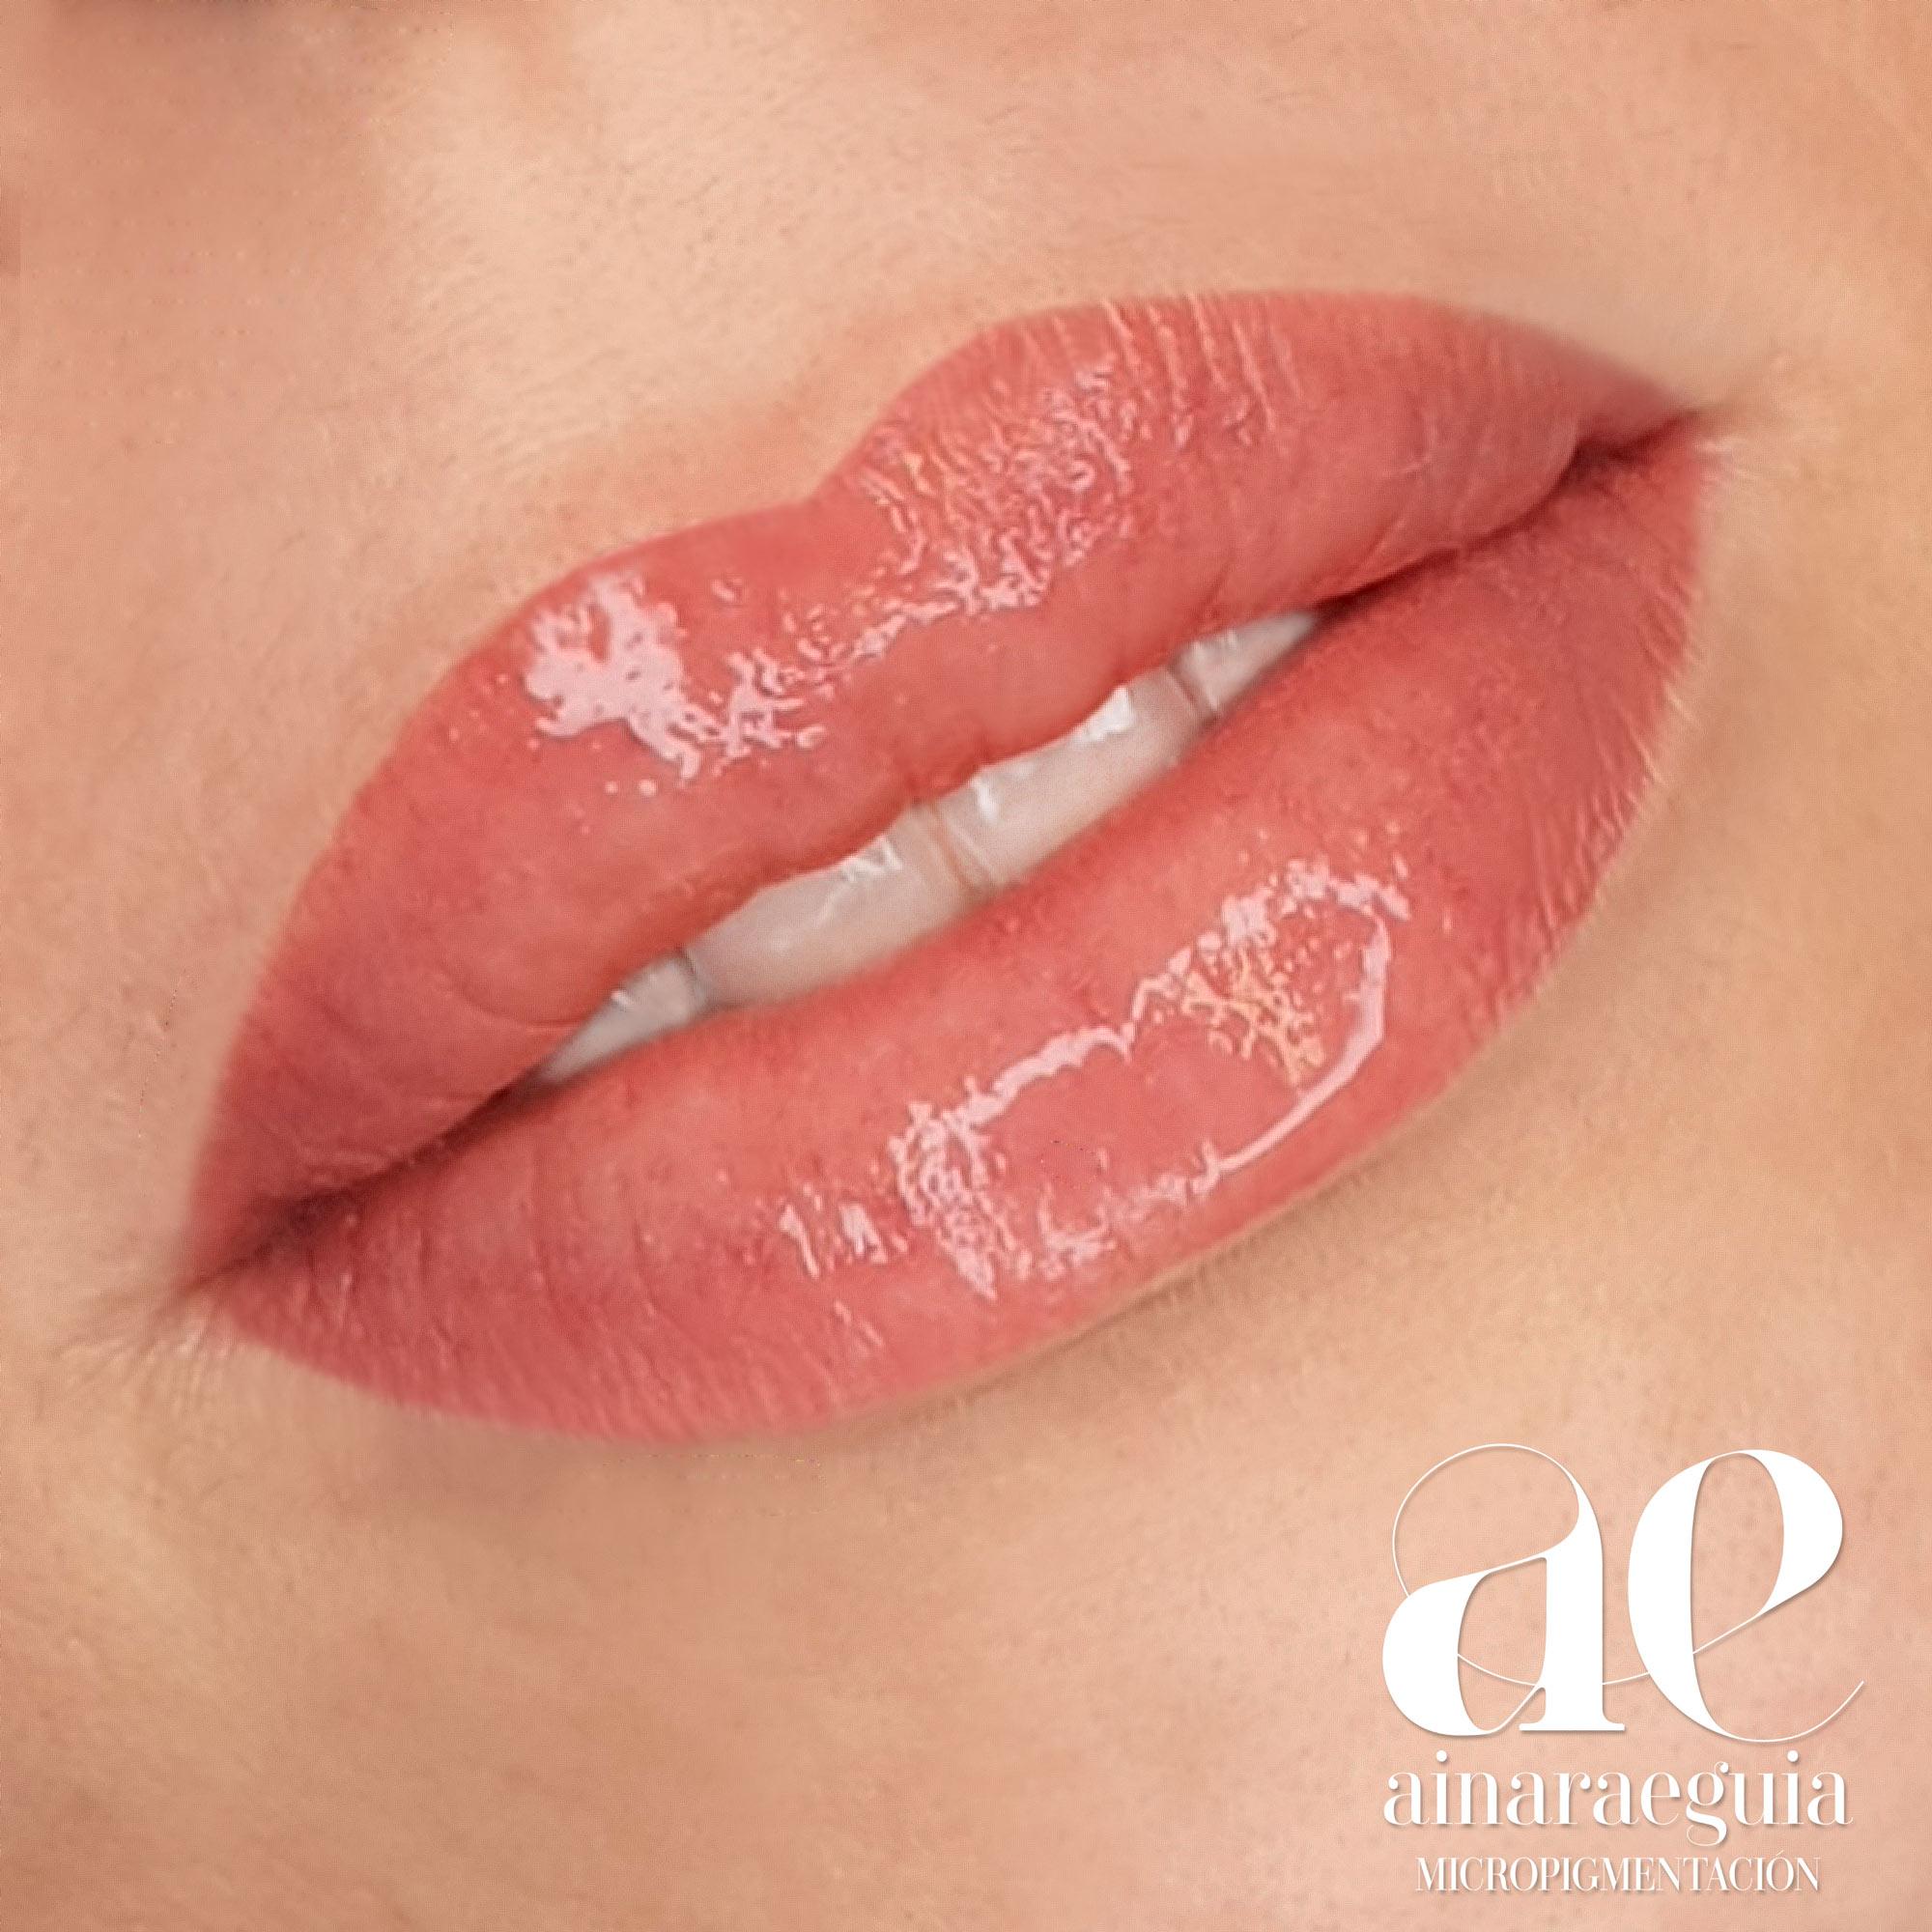 ainara eguia correción de micropigmentacion labios bilbao microblanding softap cejas ojos labios capilar cicatrices bilbao micropigmentación